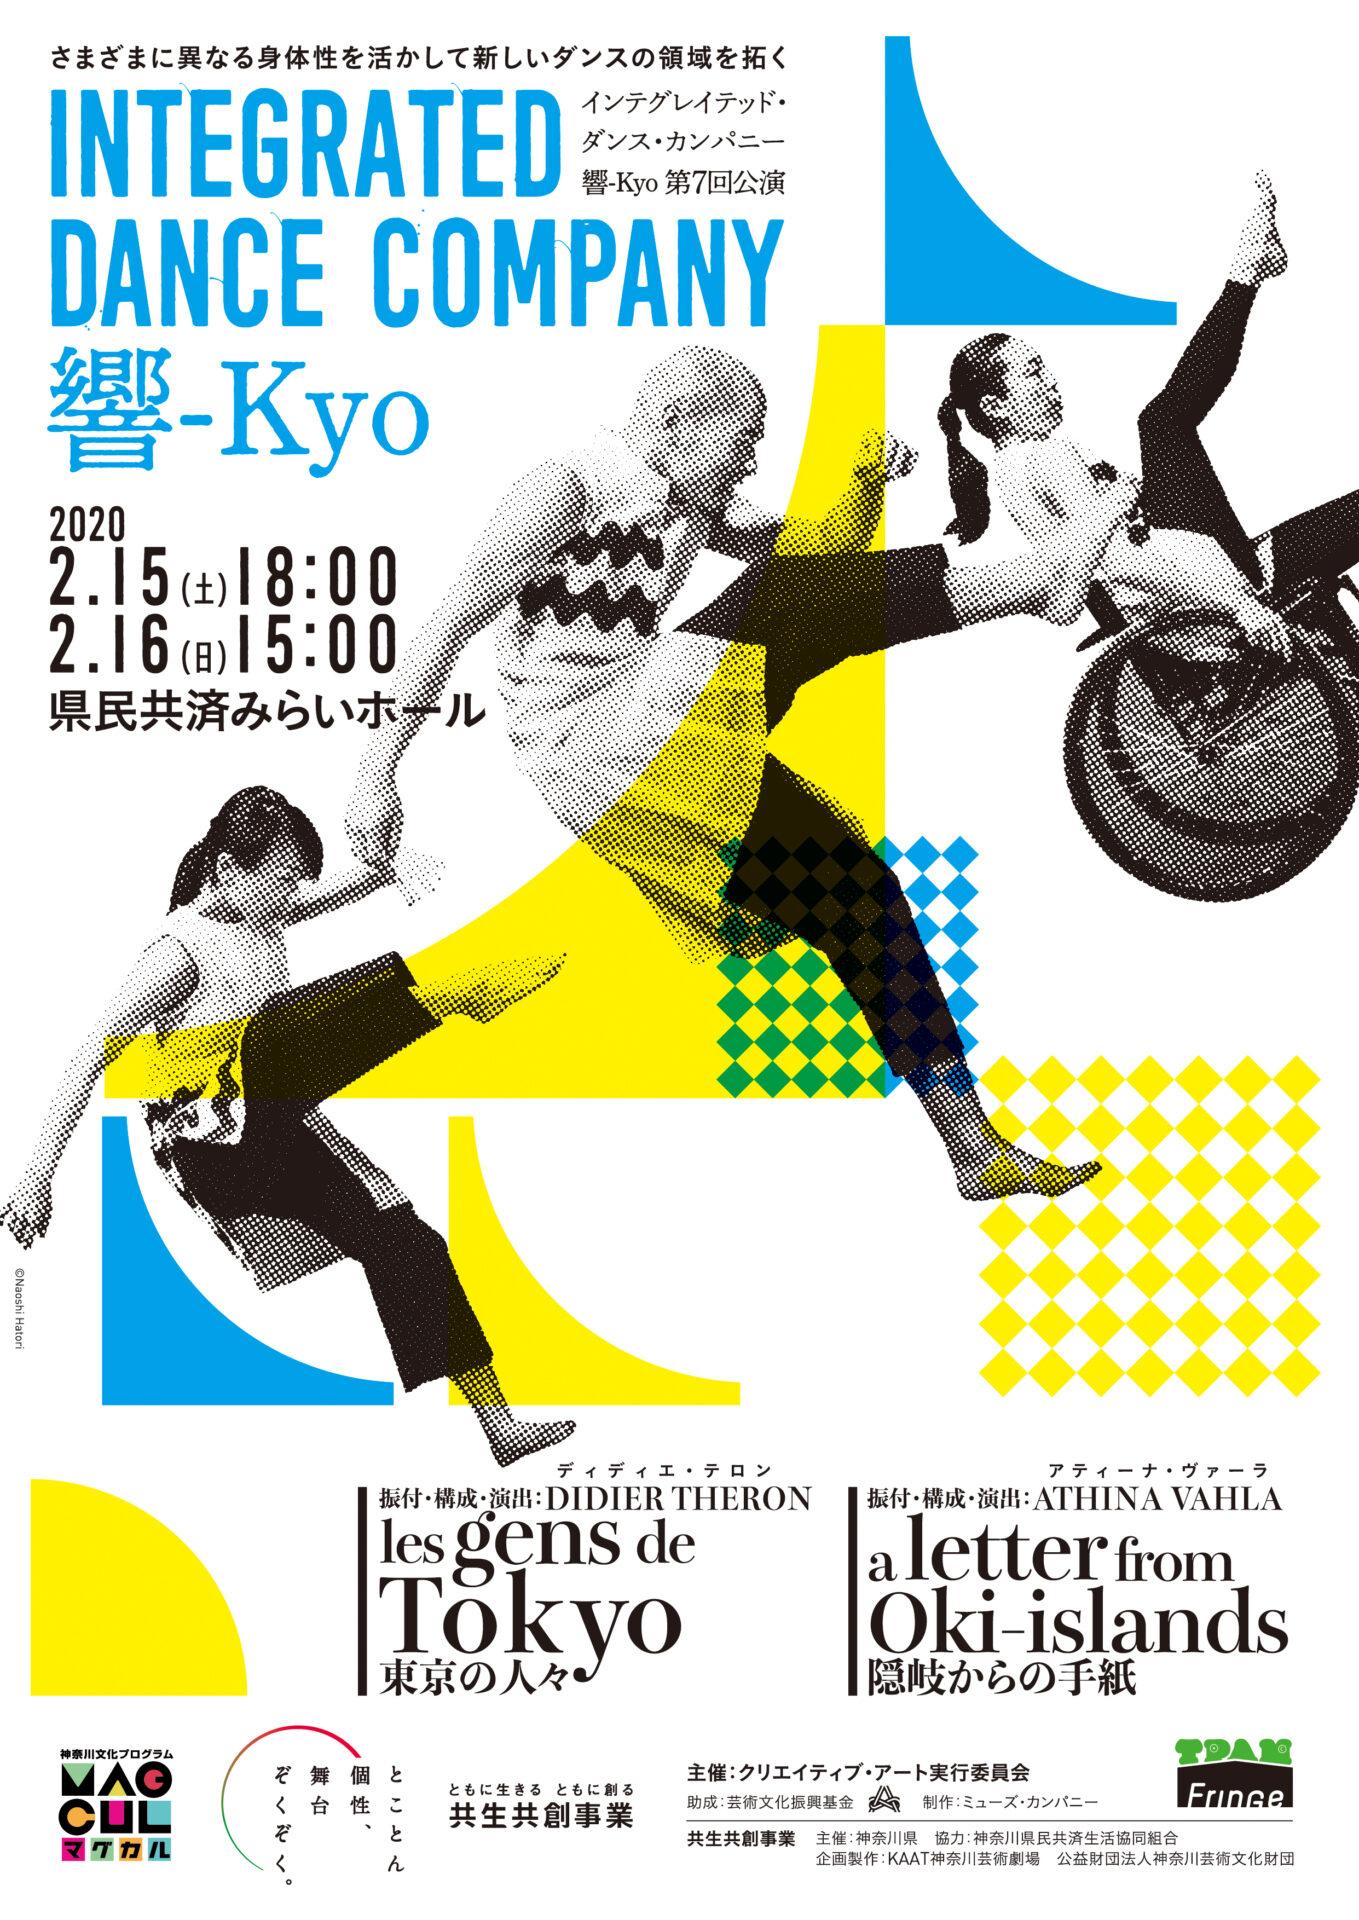 Integrated Dance Company響-Kyo第7回公演